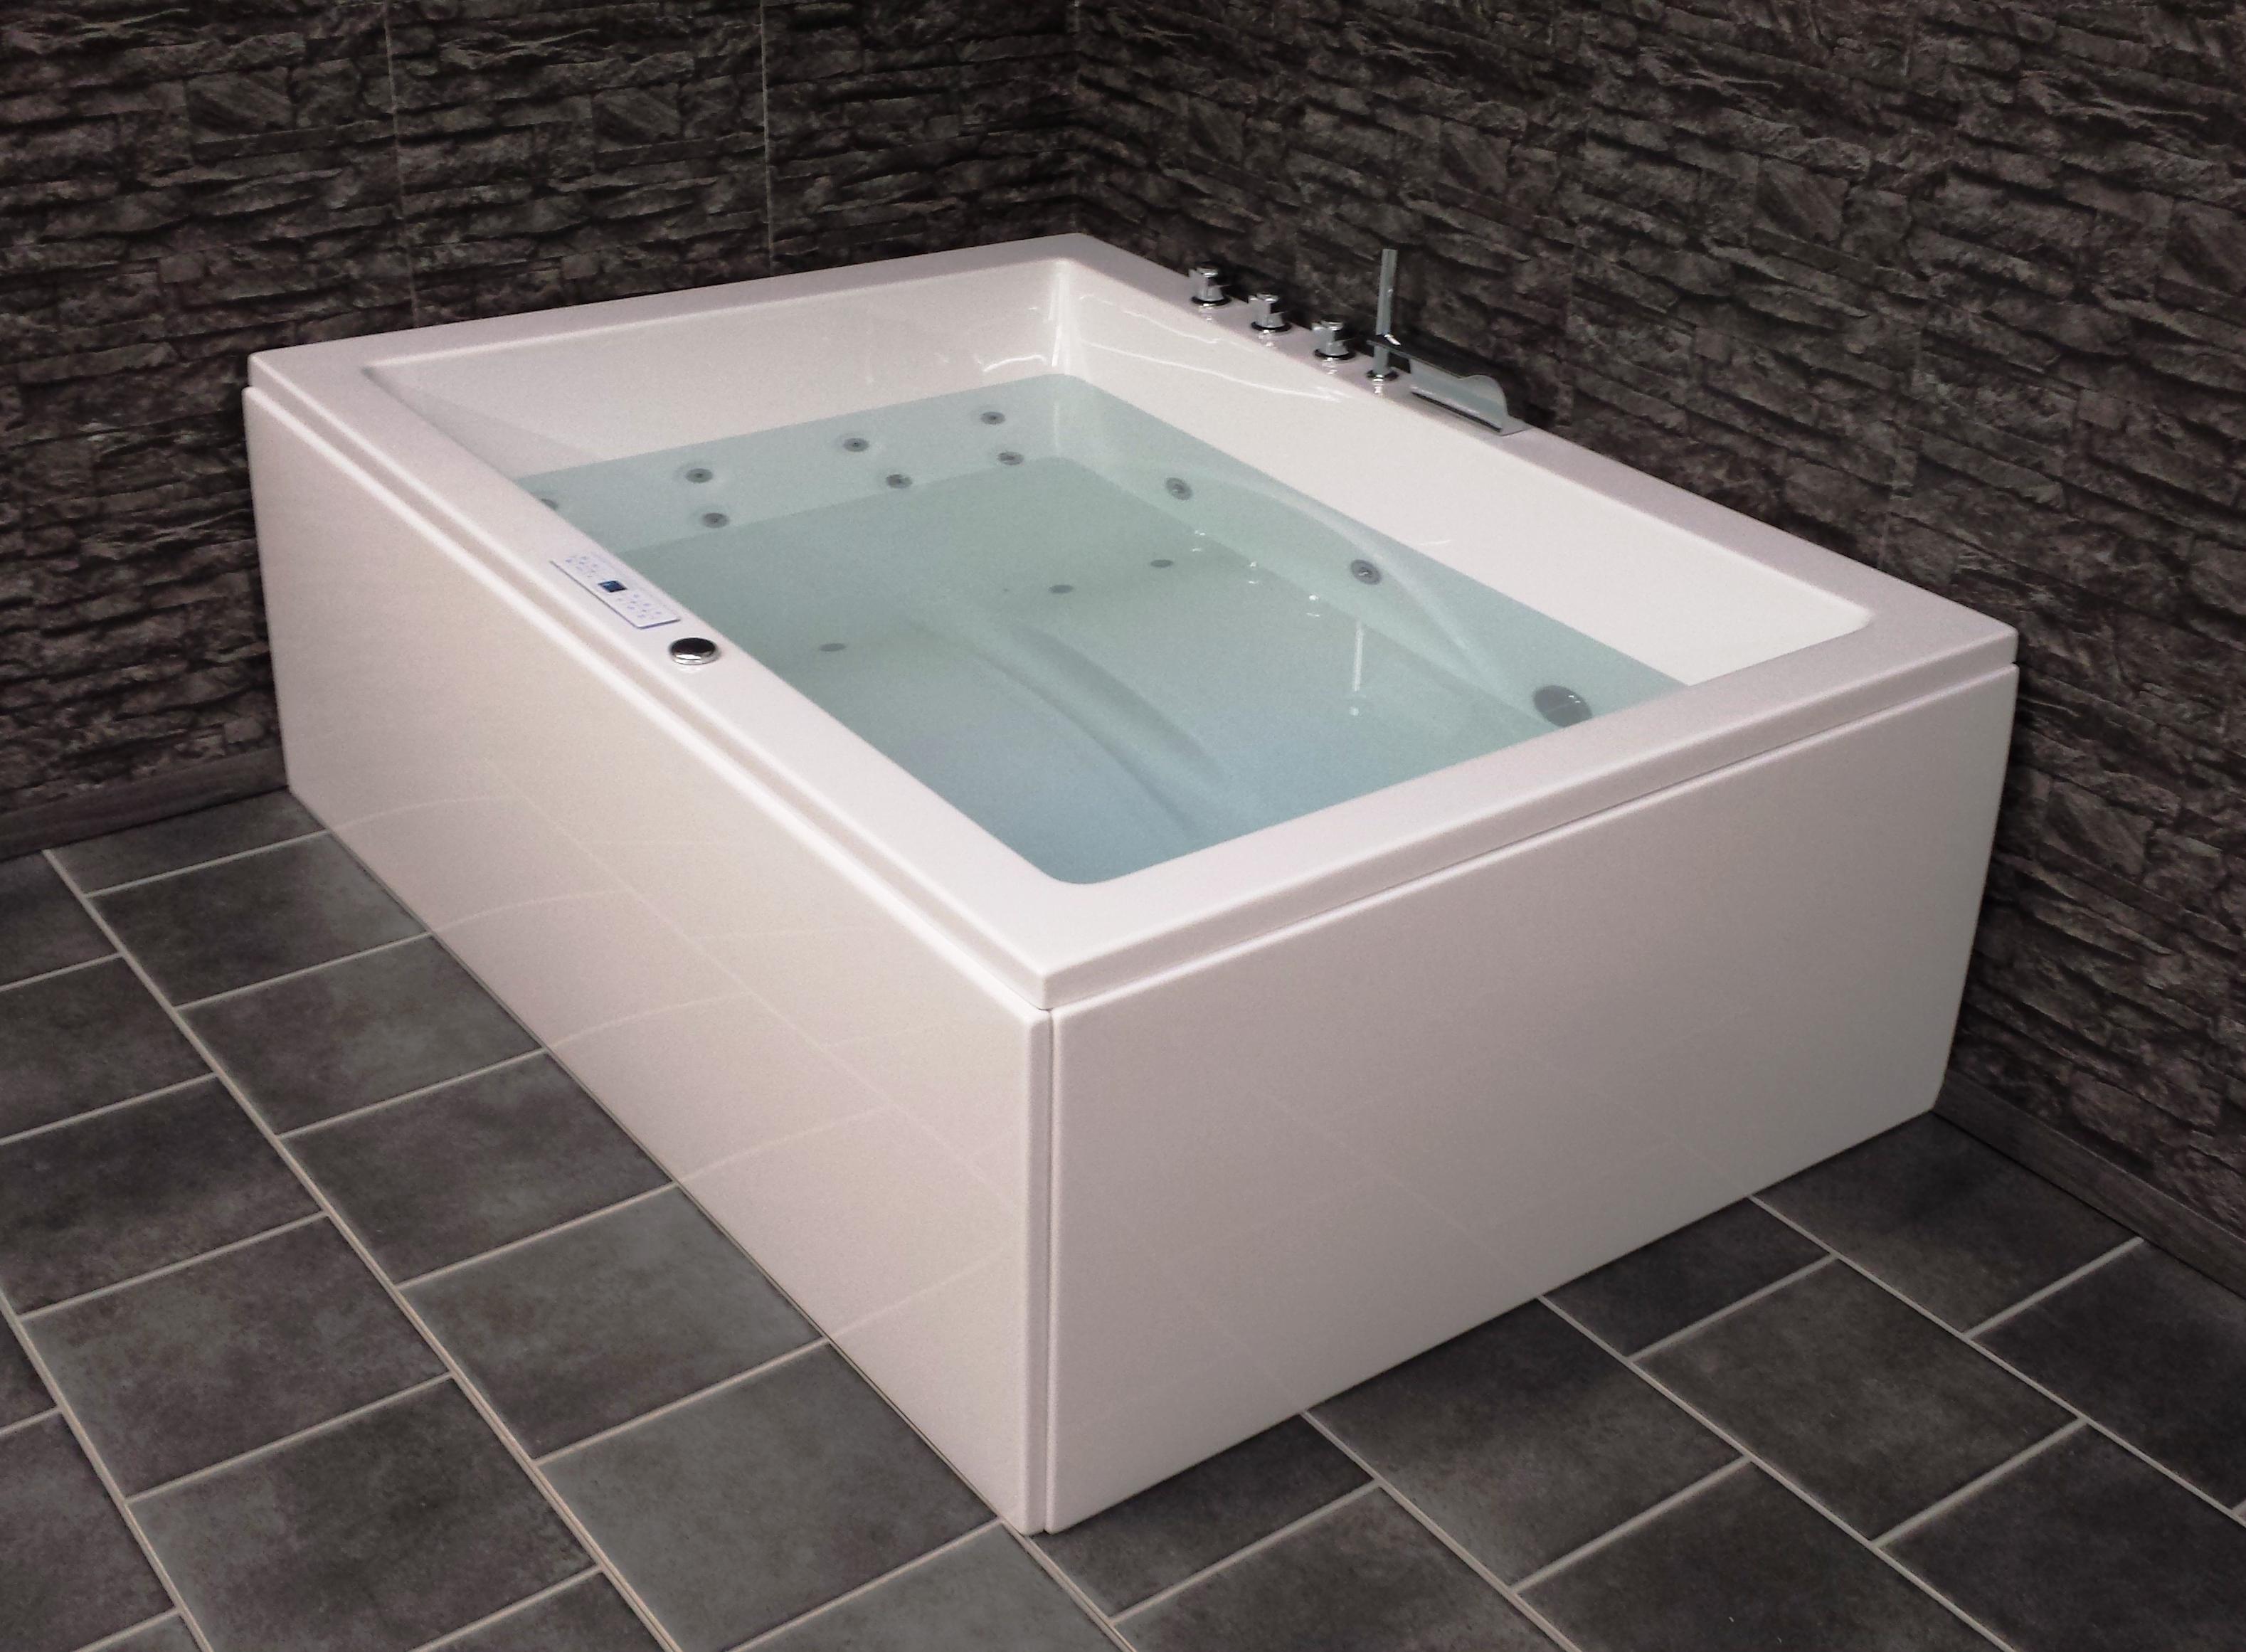 luxury whirlpool bathtub giant indoor spa jacuzzi top quality ebay